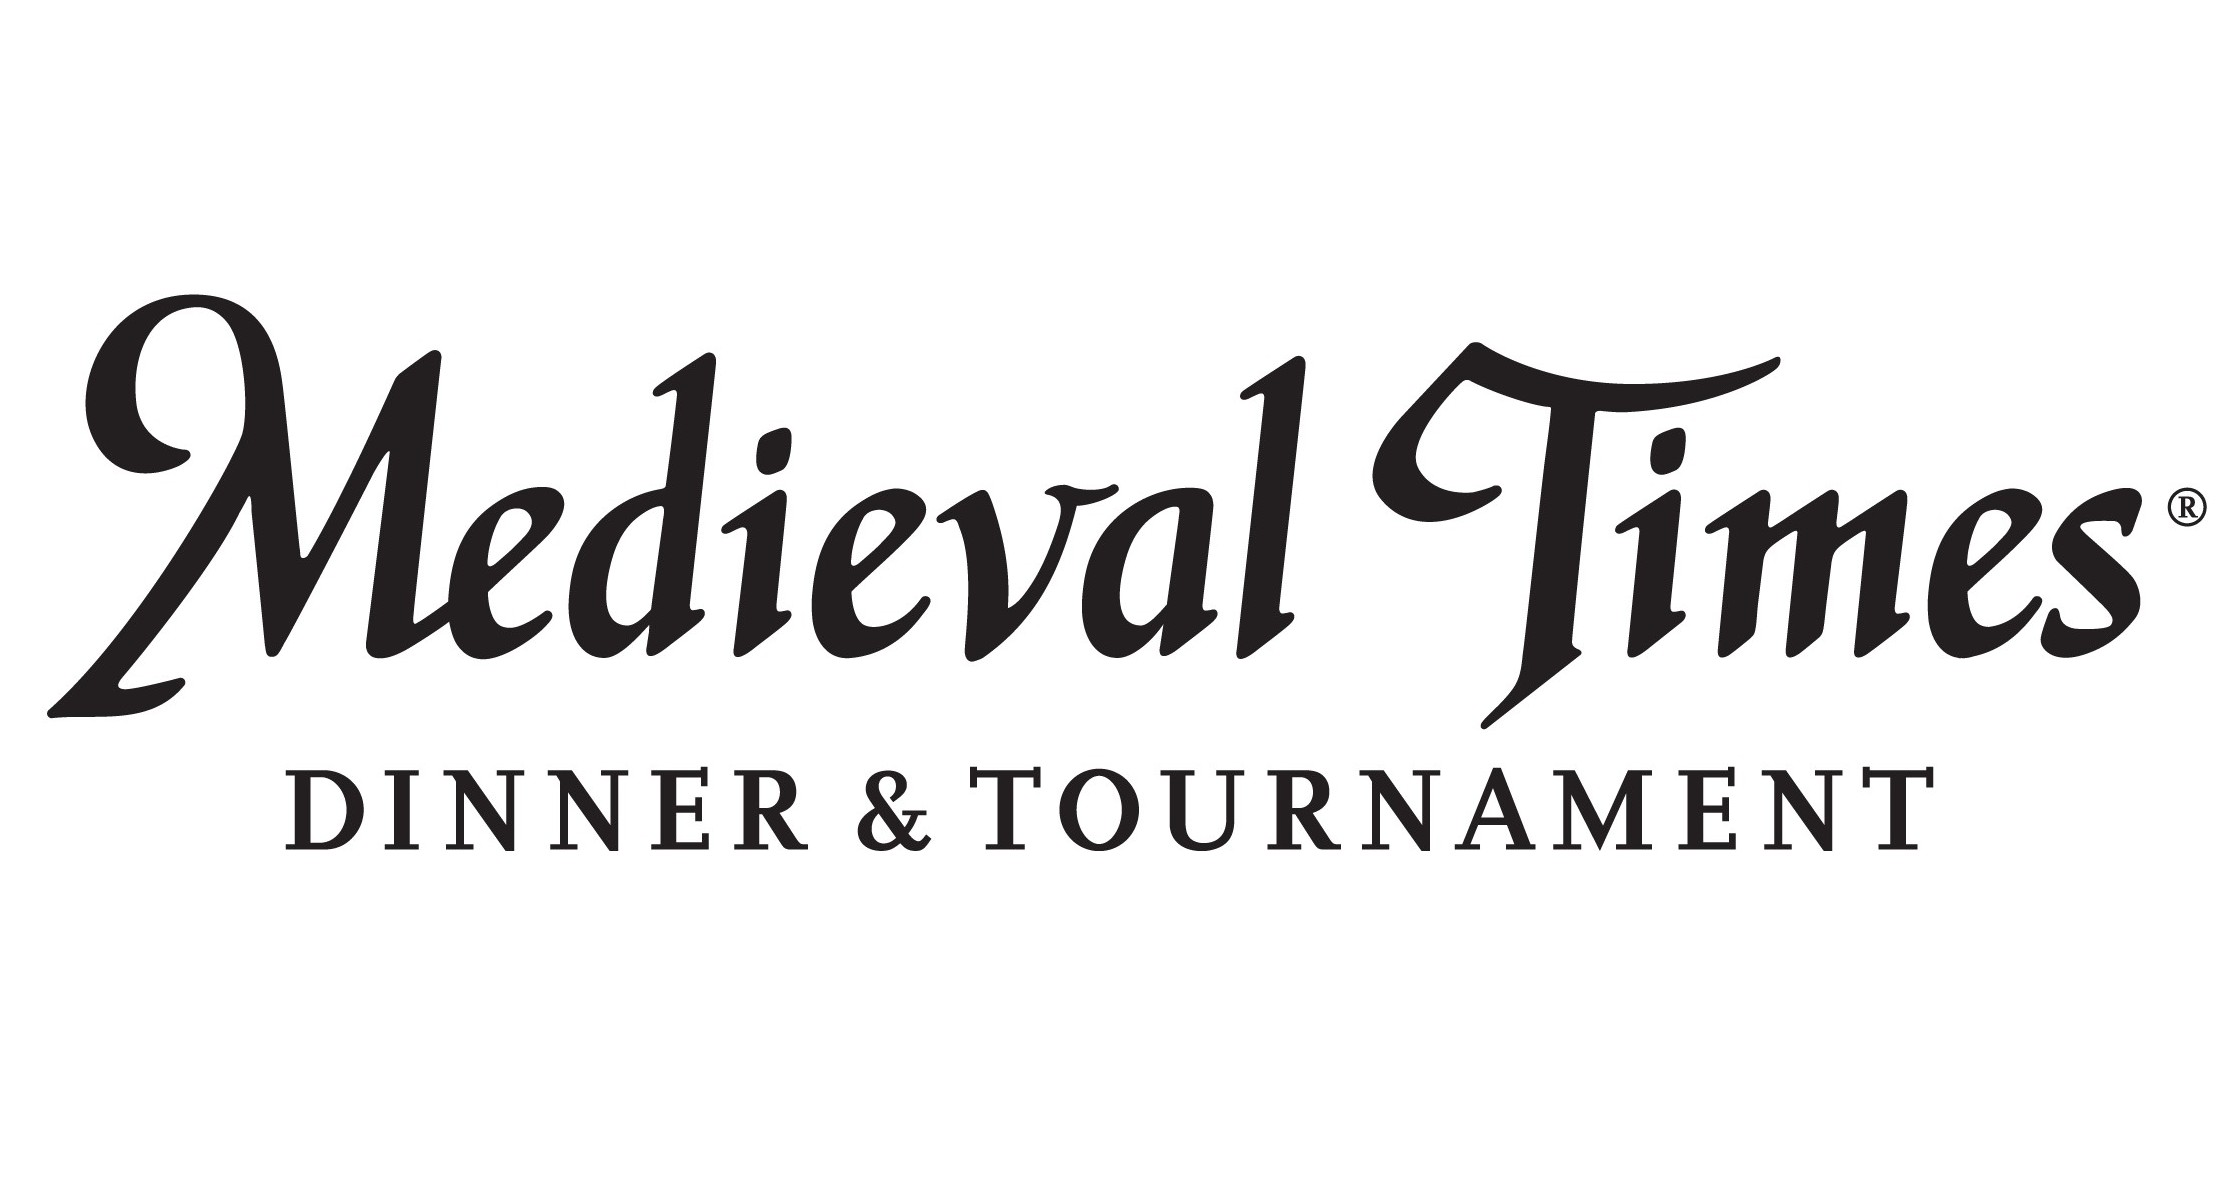 4ff8010a6c751_MedievalTimes_logo_REV_FA